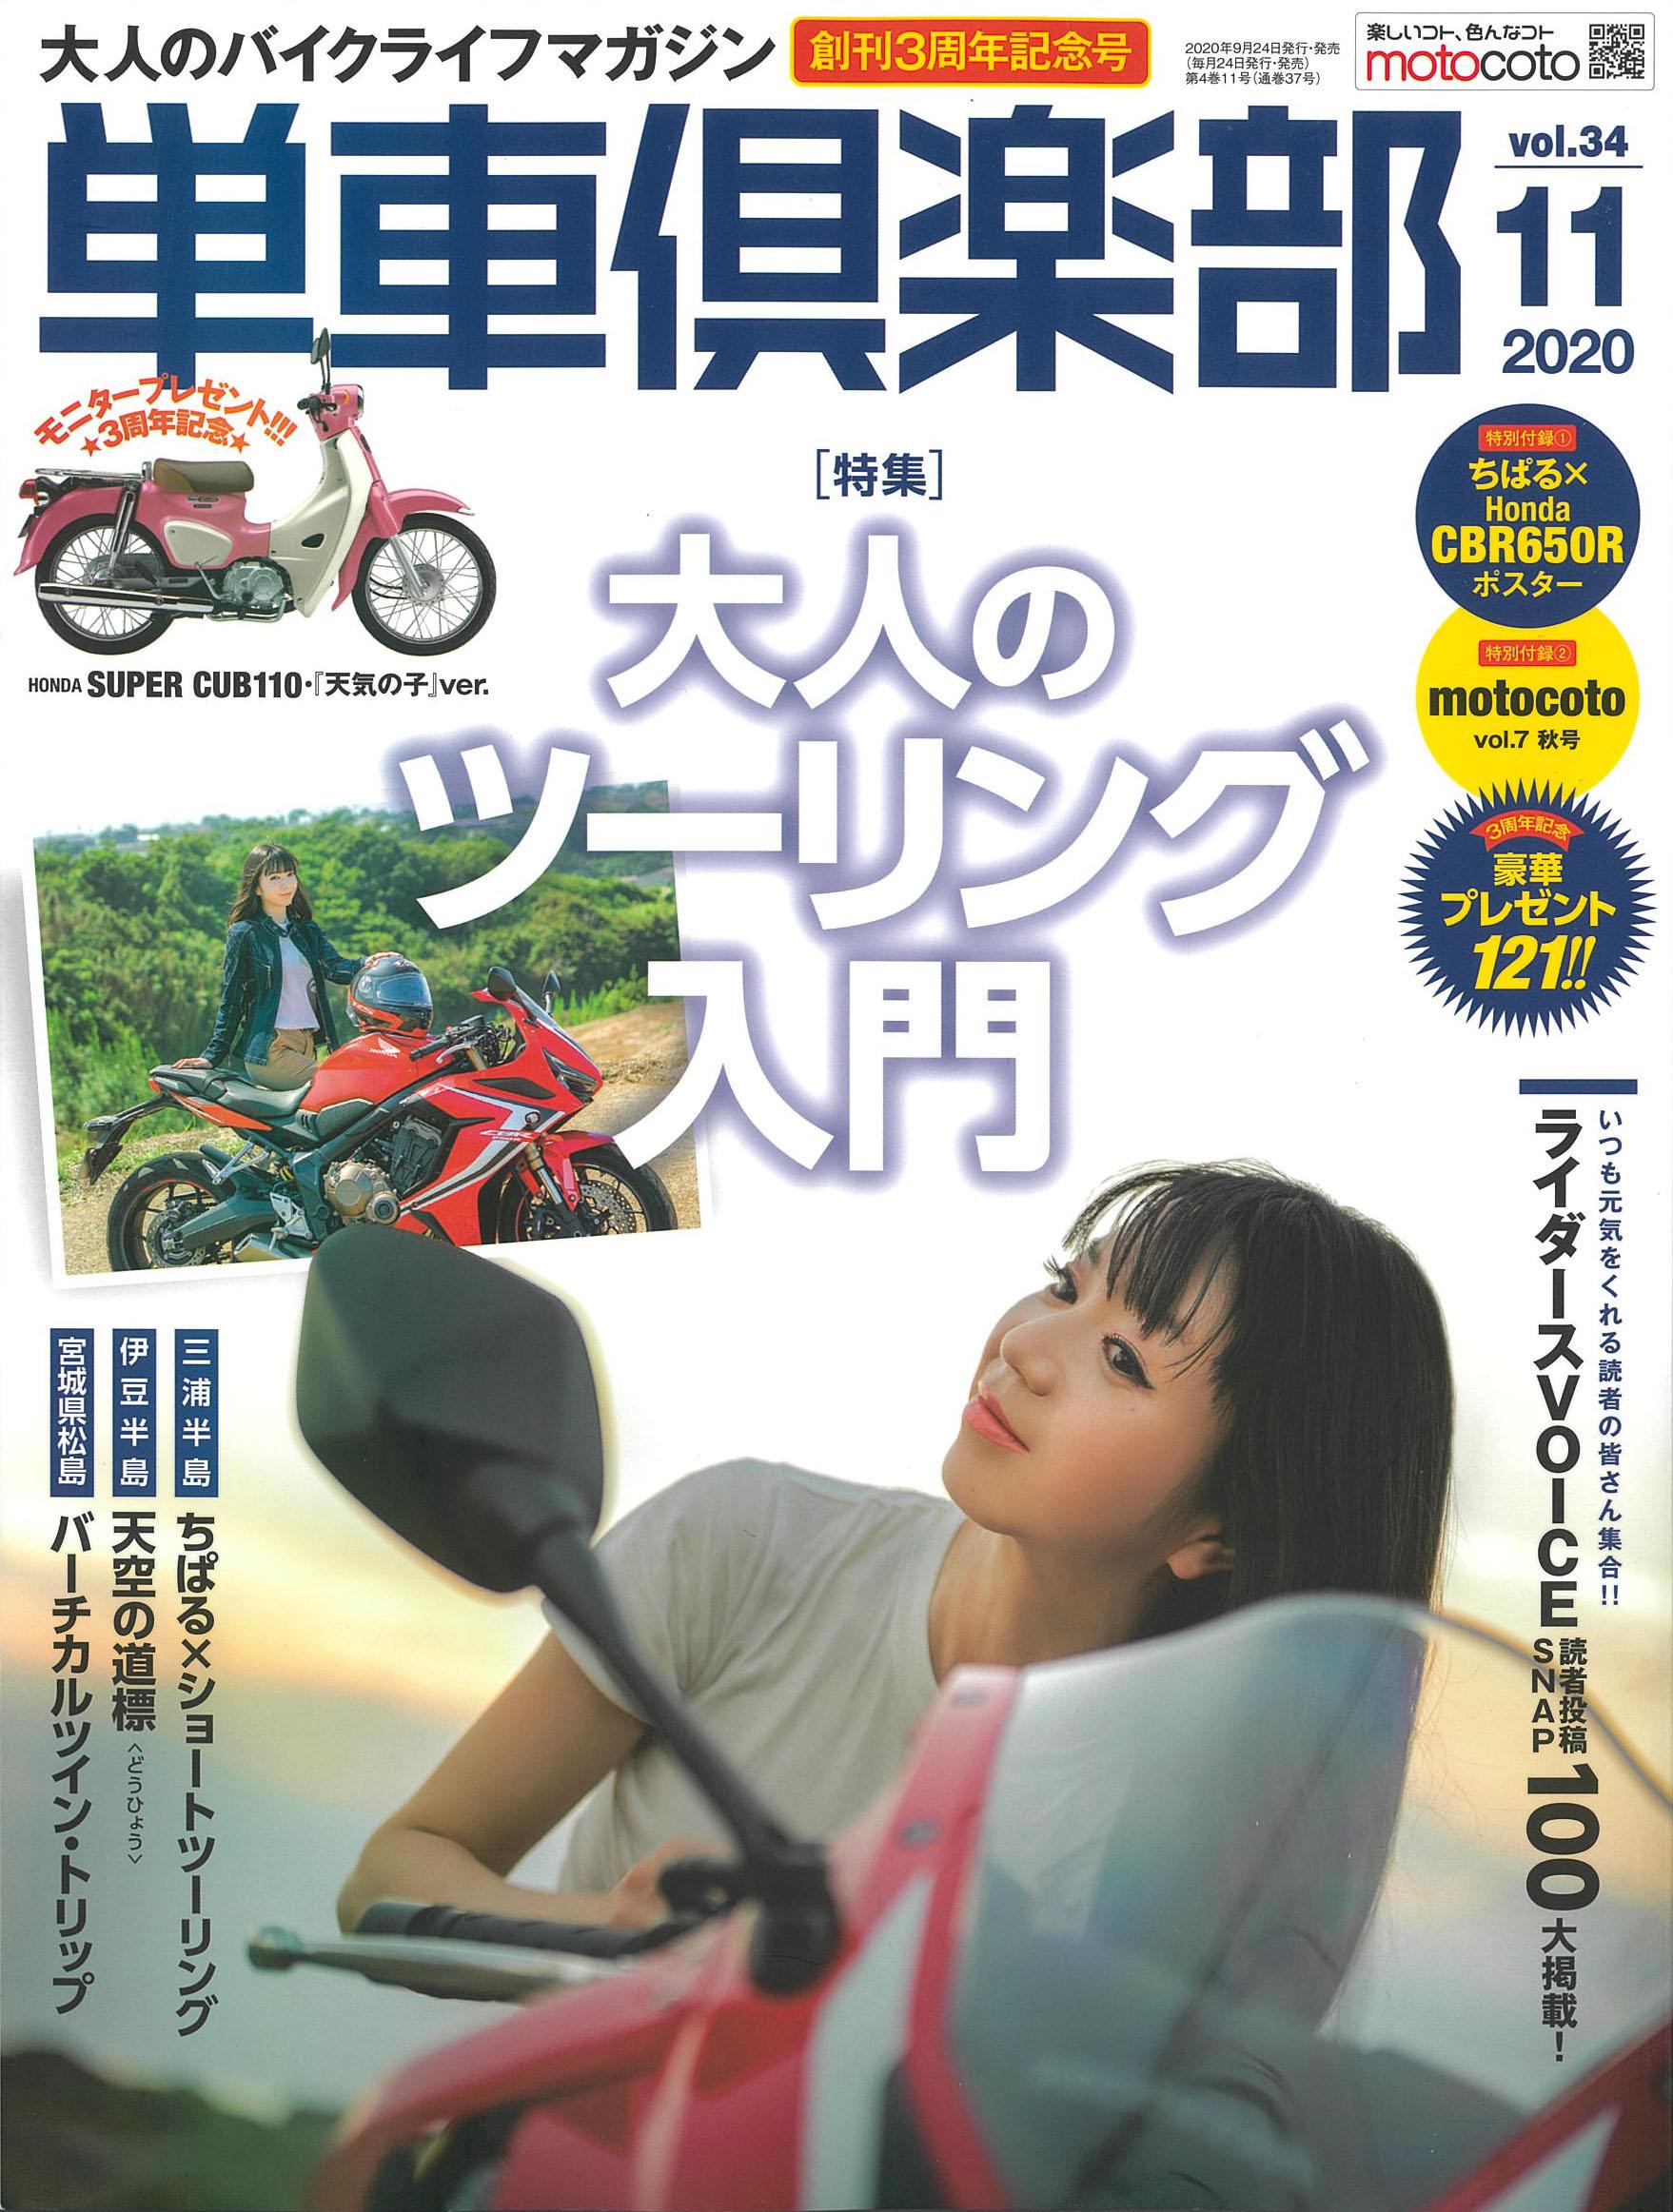 【単車倶楽部11月号掲載】FANTIC CABALLERO SCRAMBLER500